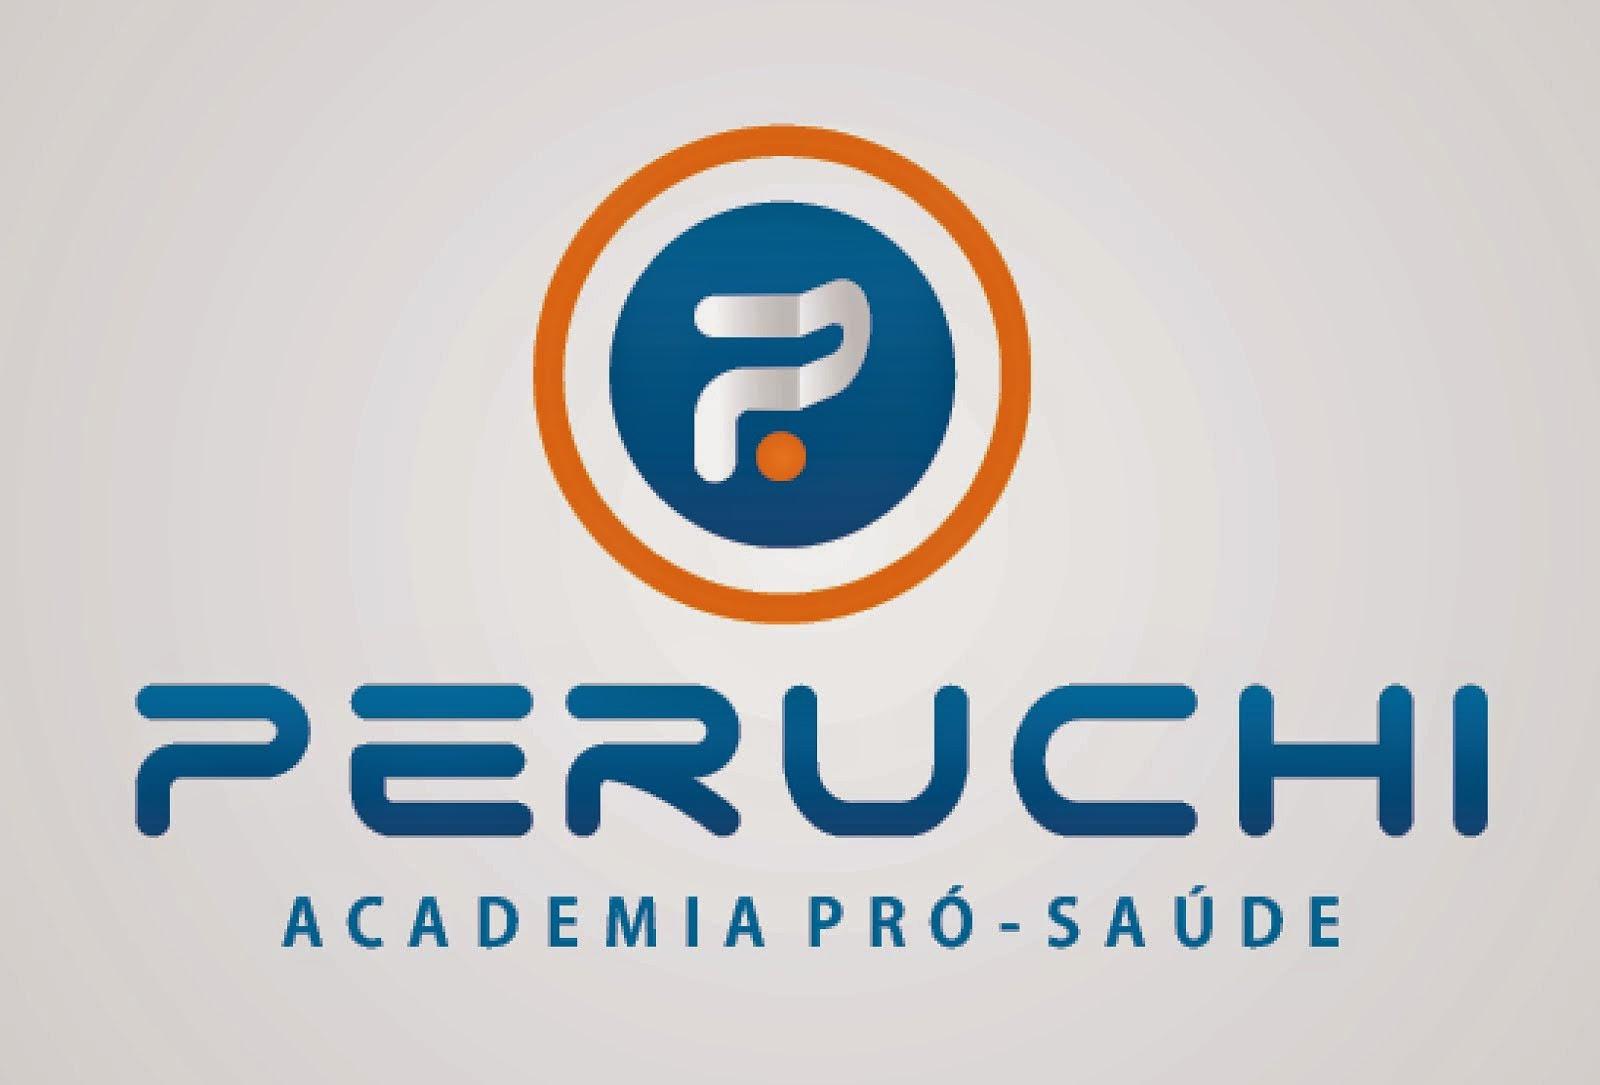 Peruchi Academia - Pró Saúde